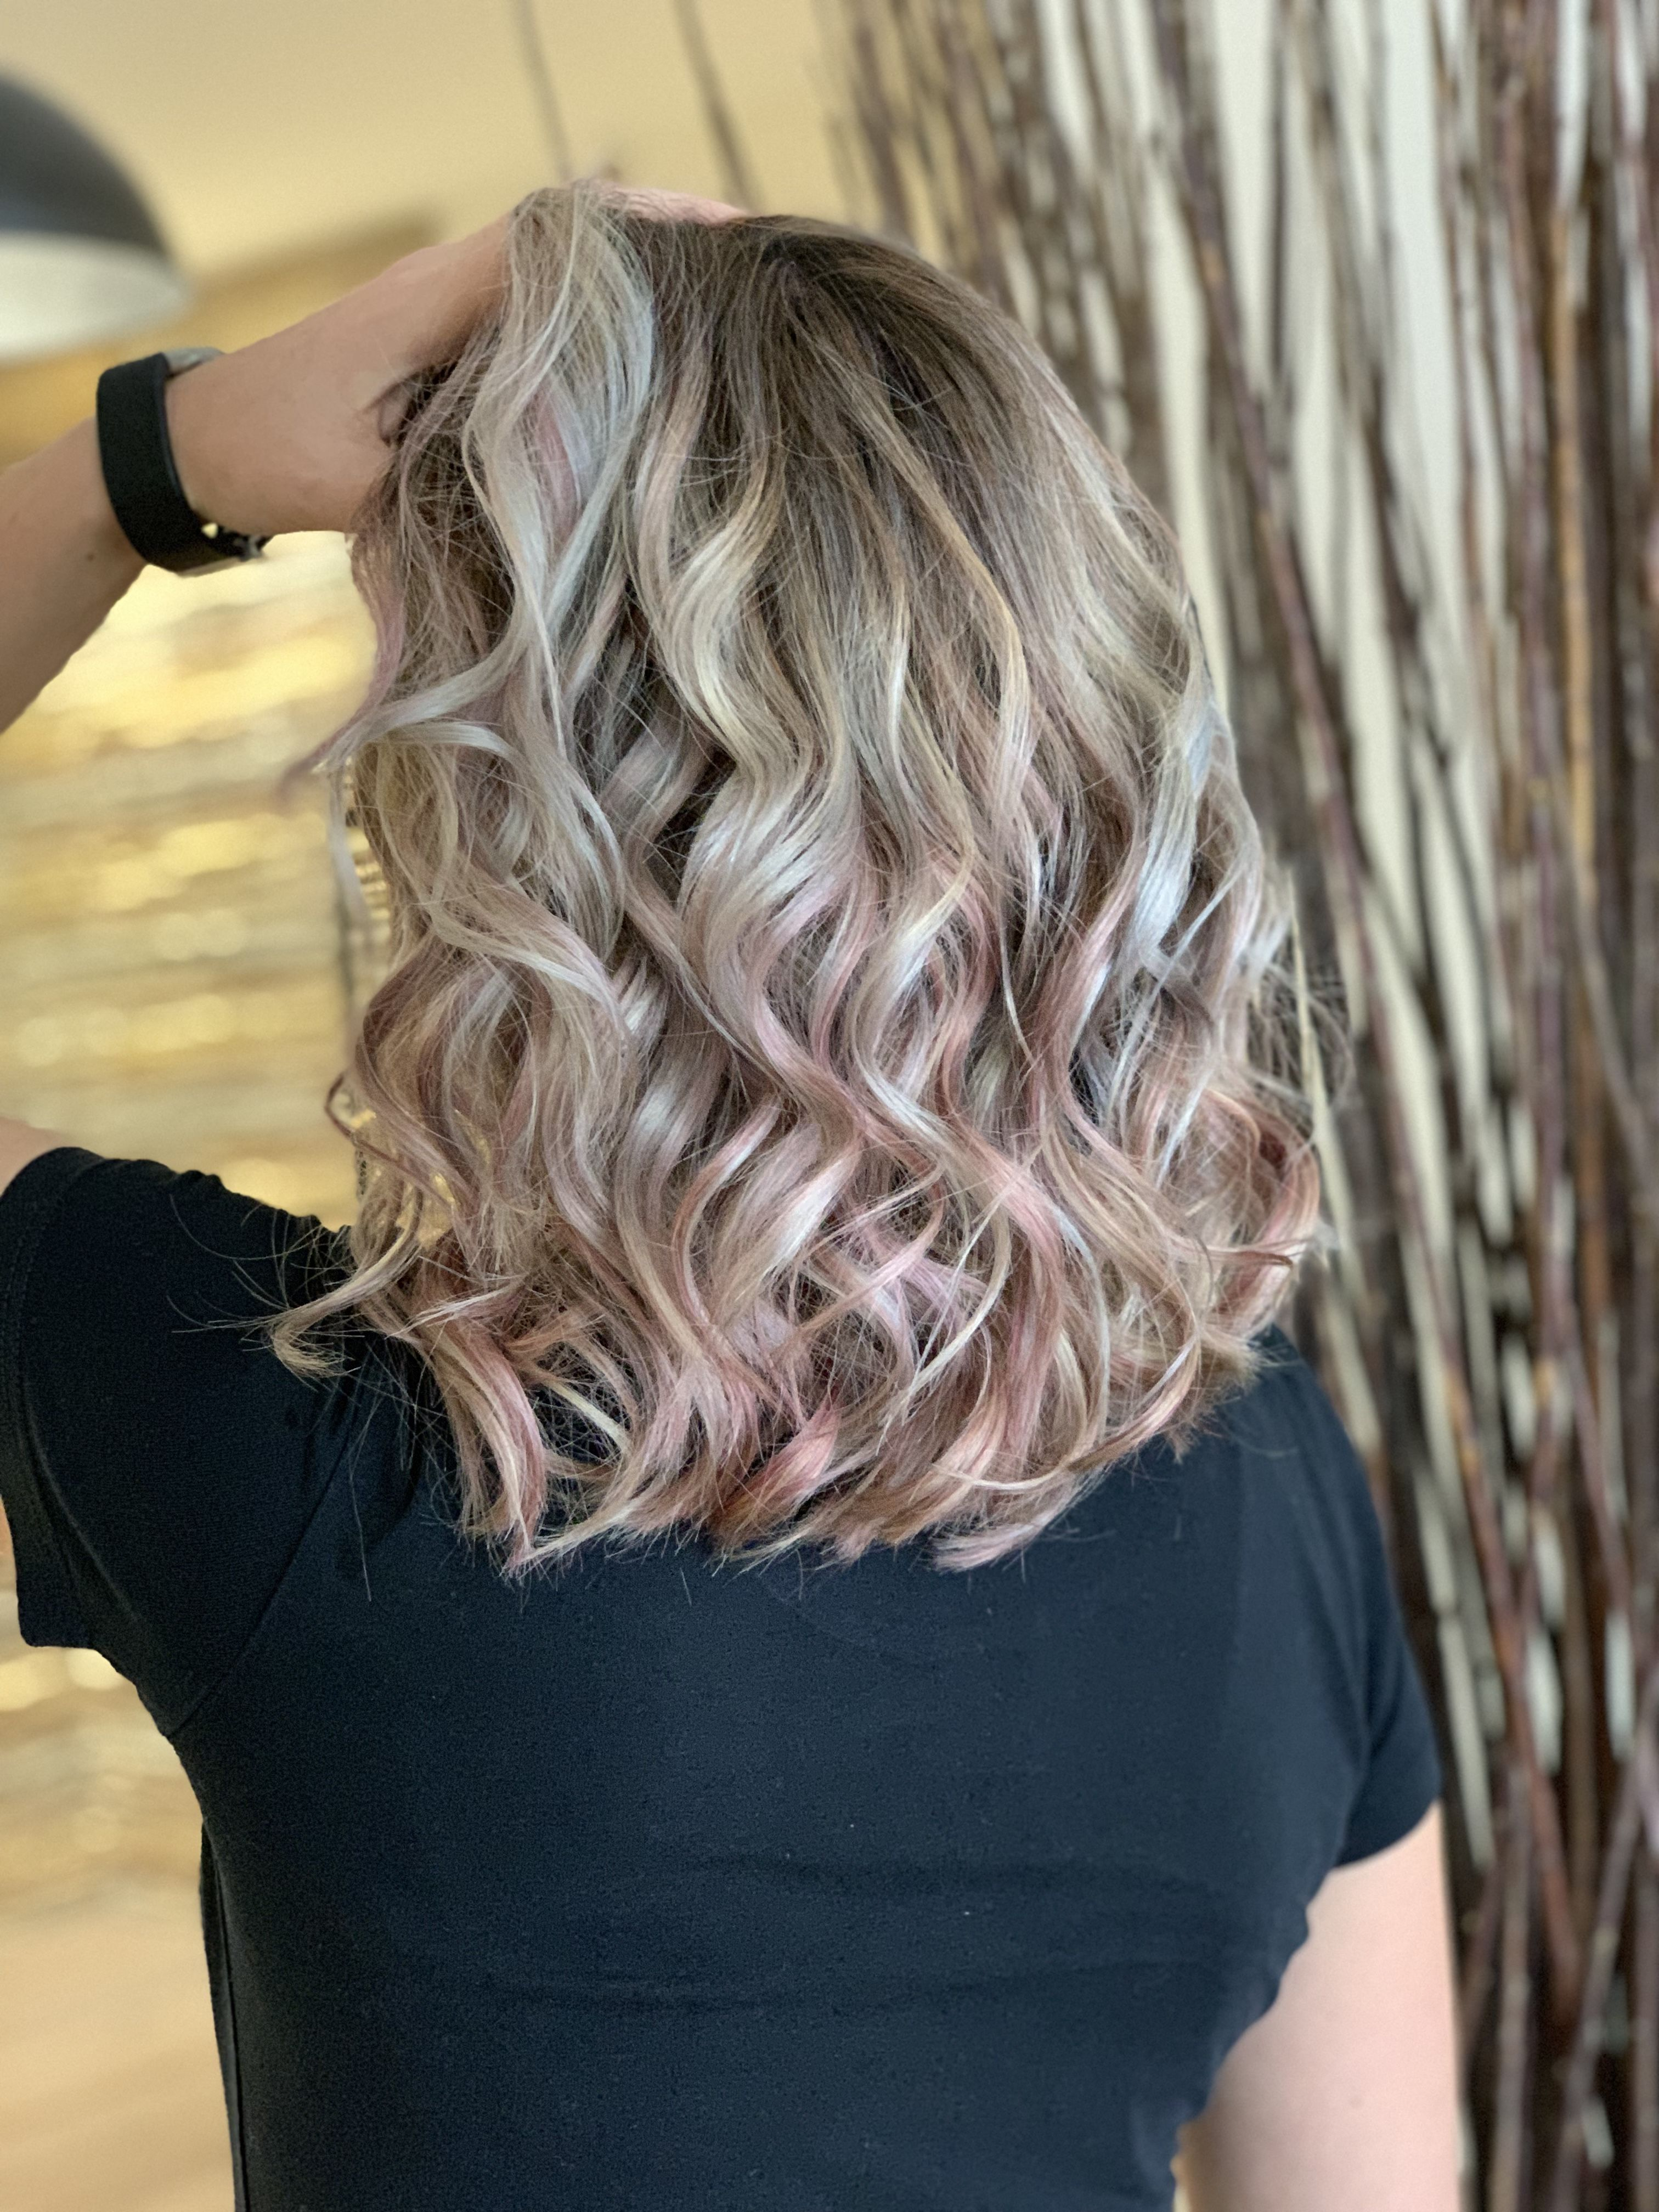 Balayage Hair Grey Grau Rosa Haare Locken Frisuren Haare Balayage Locken Machen